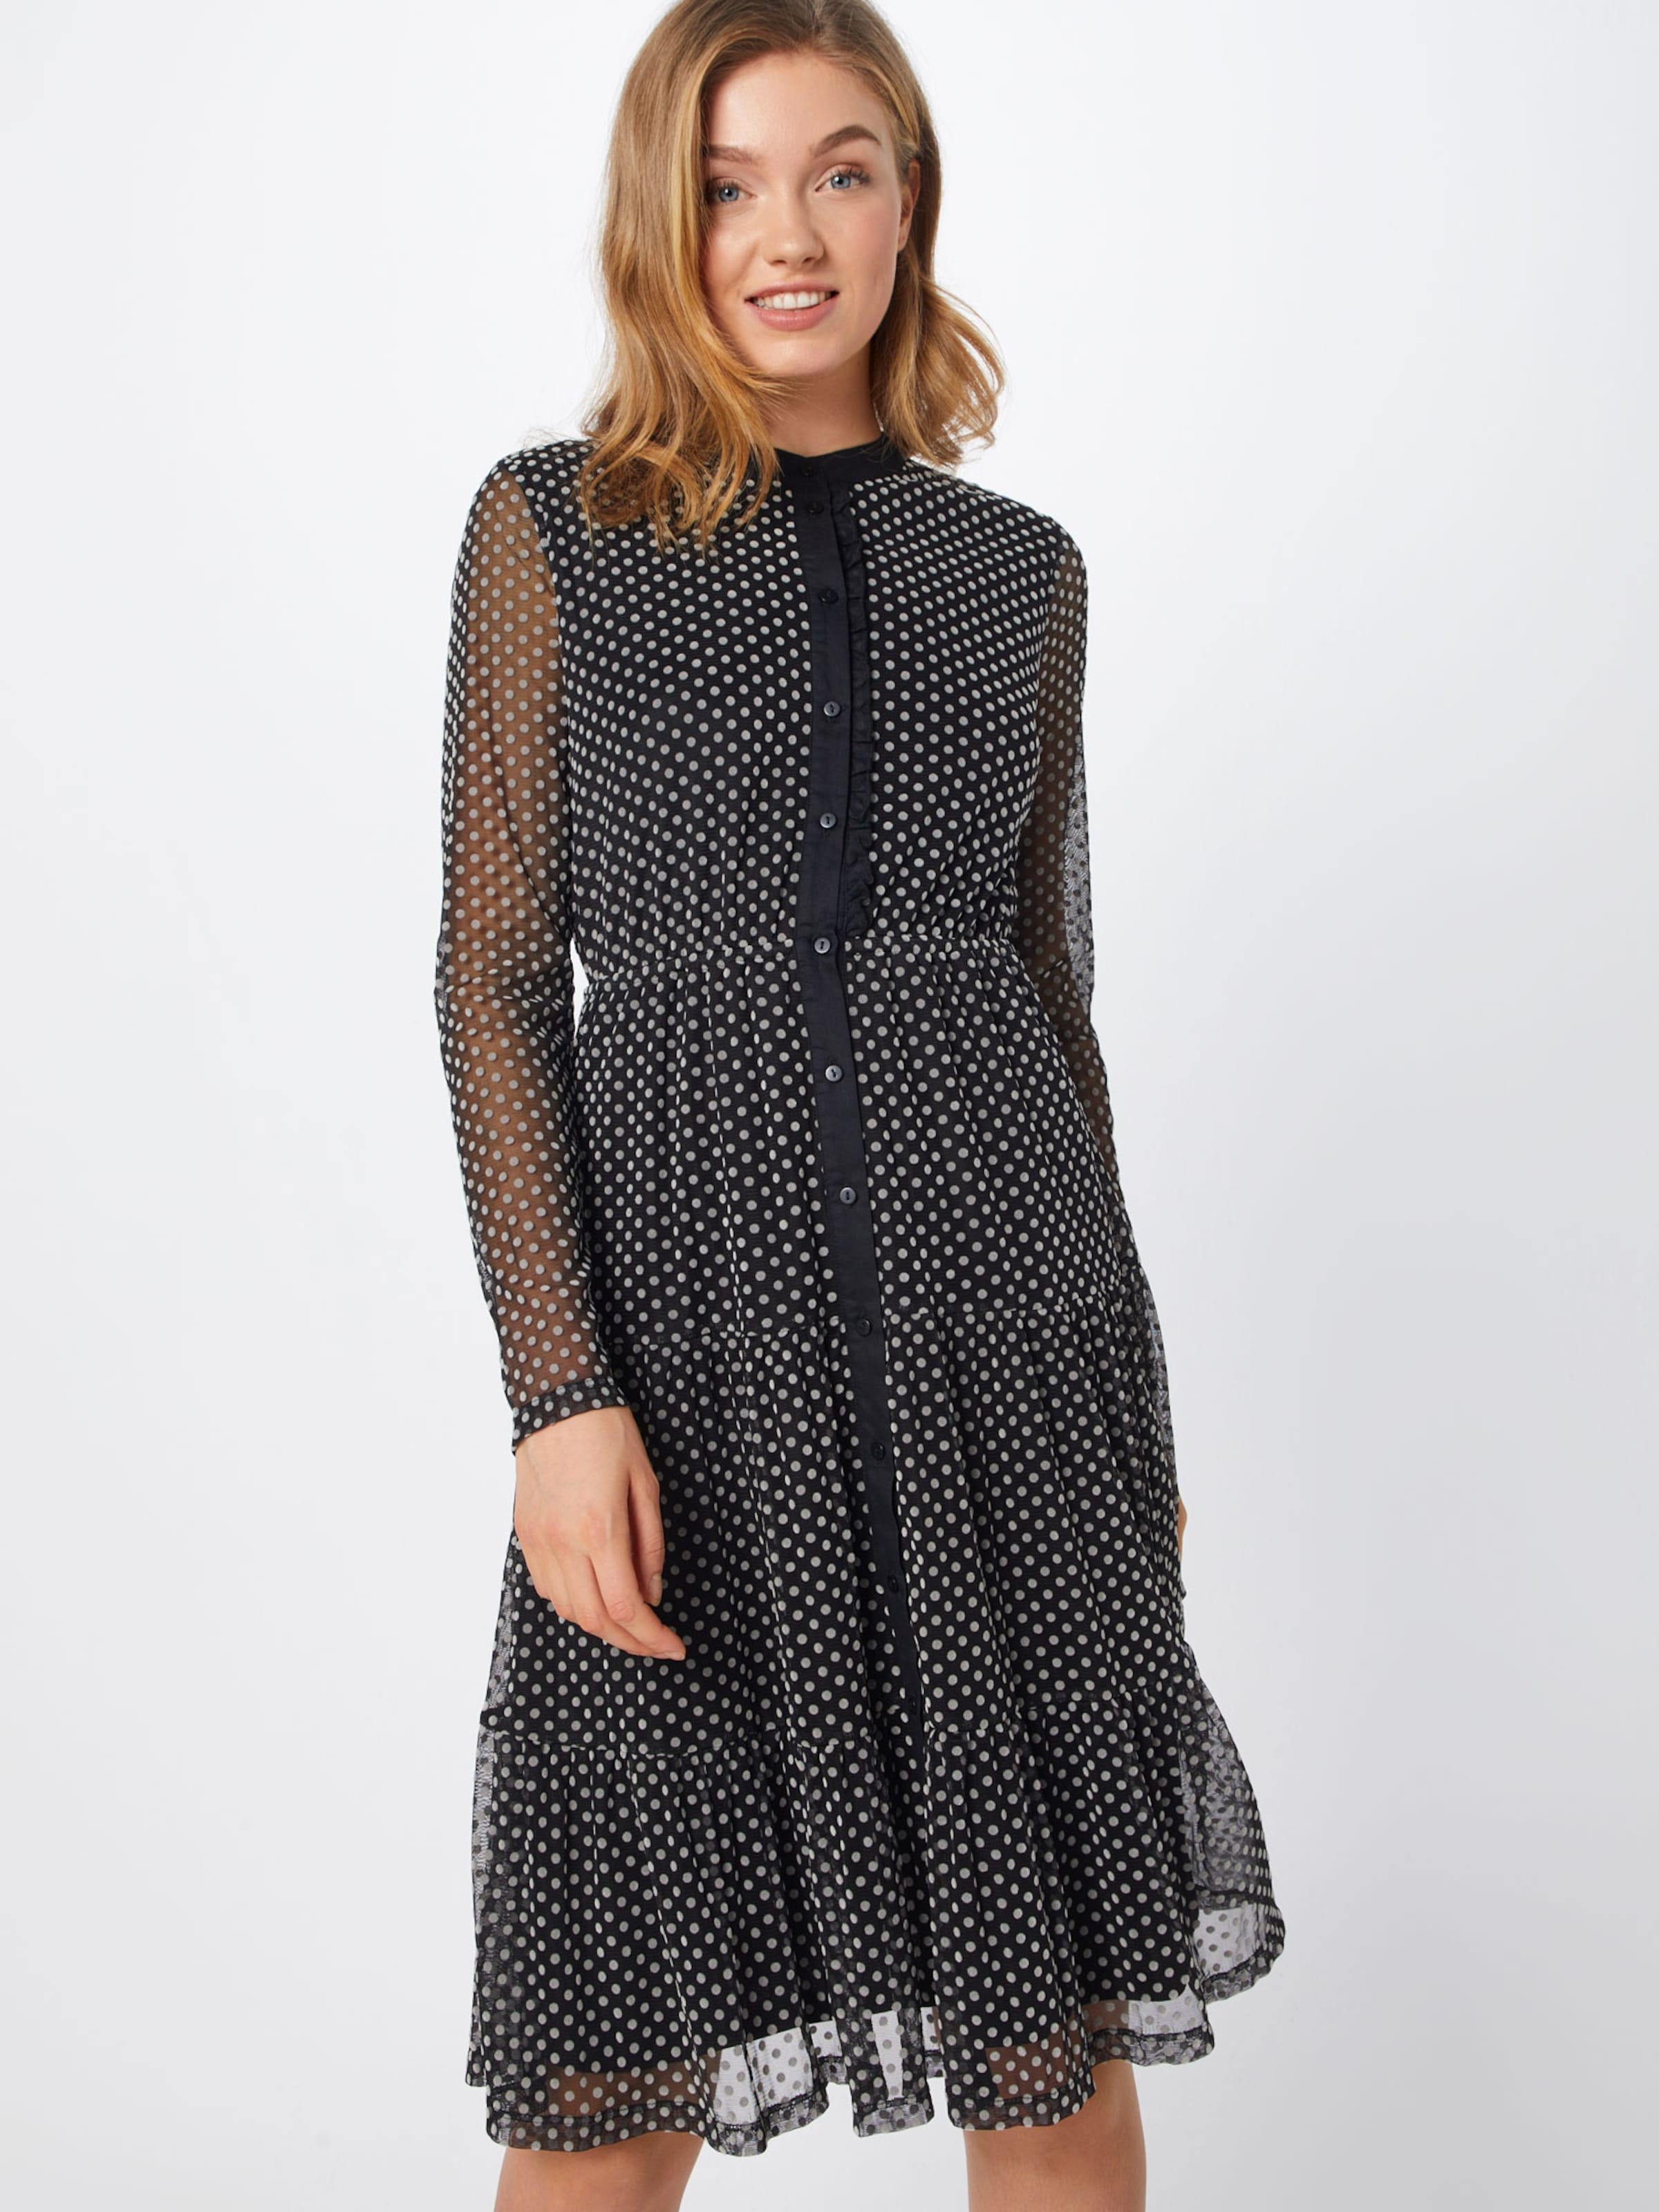 chemise Noir chemise Object En En Object Robe Robe Robe Noir Object iPukZX